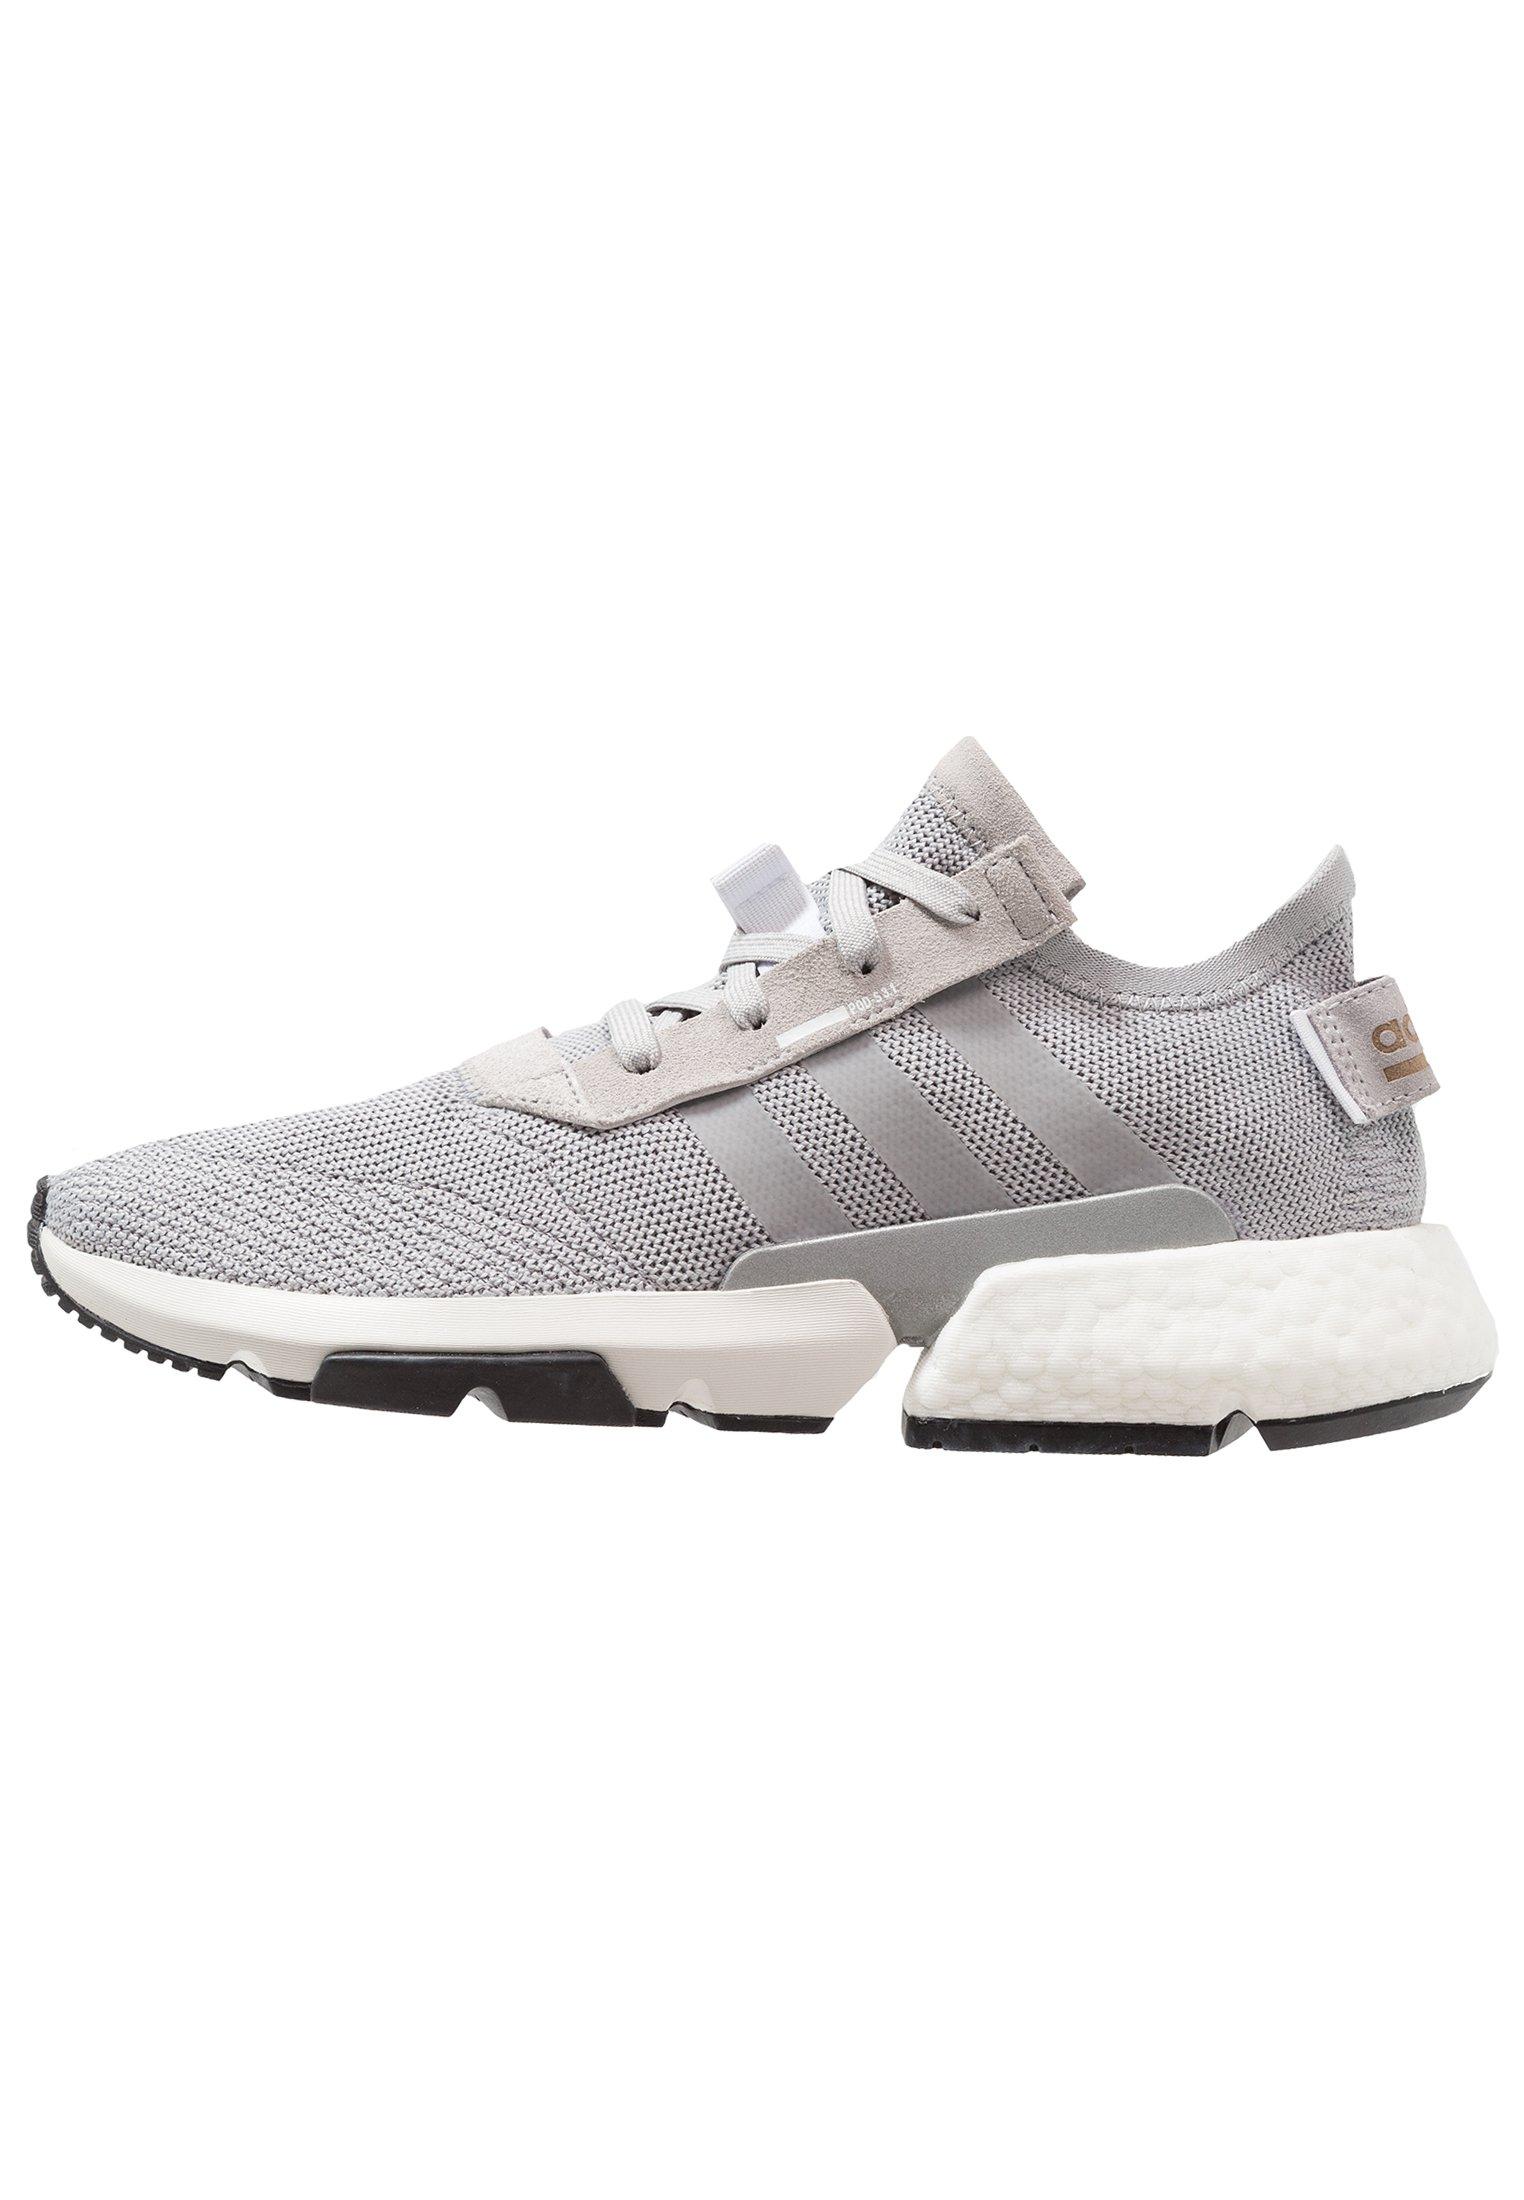 adidas Originals POD S3.1 Joggesko footwwar whitegrey